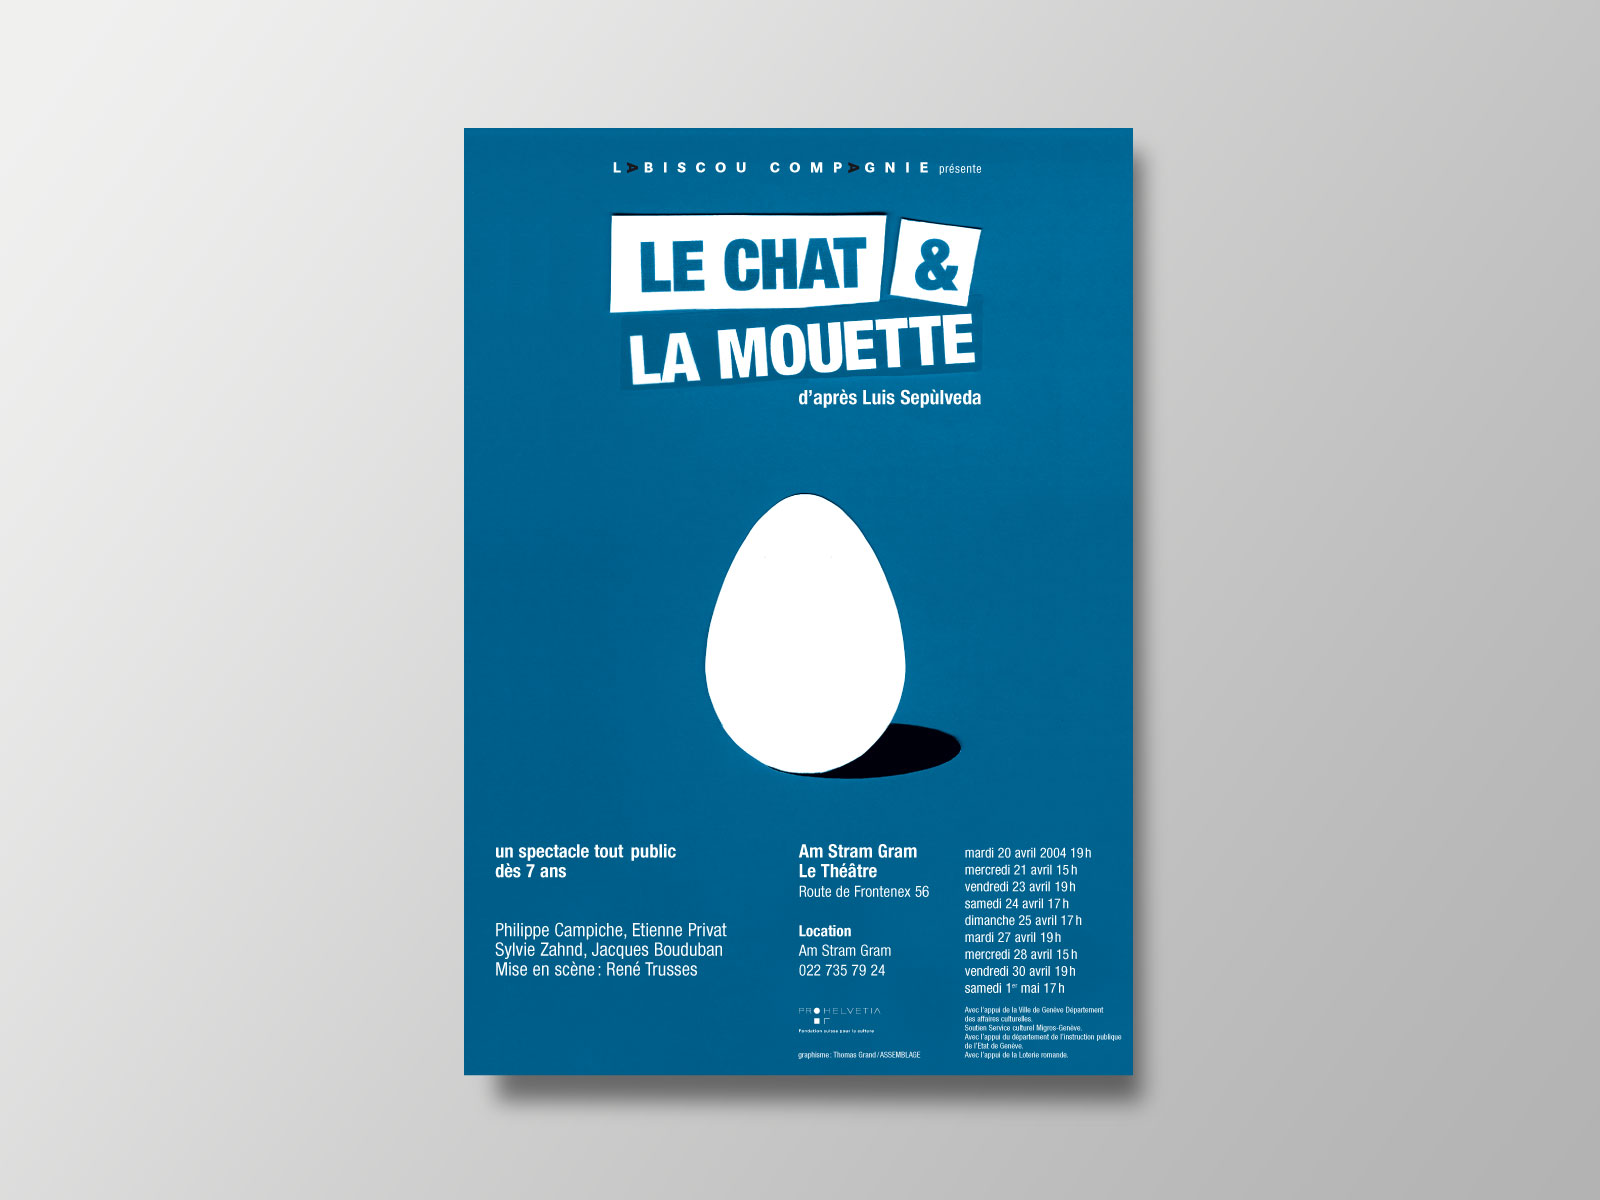 affiche-Labiscou-2-new